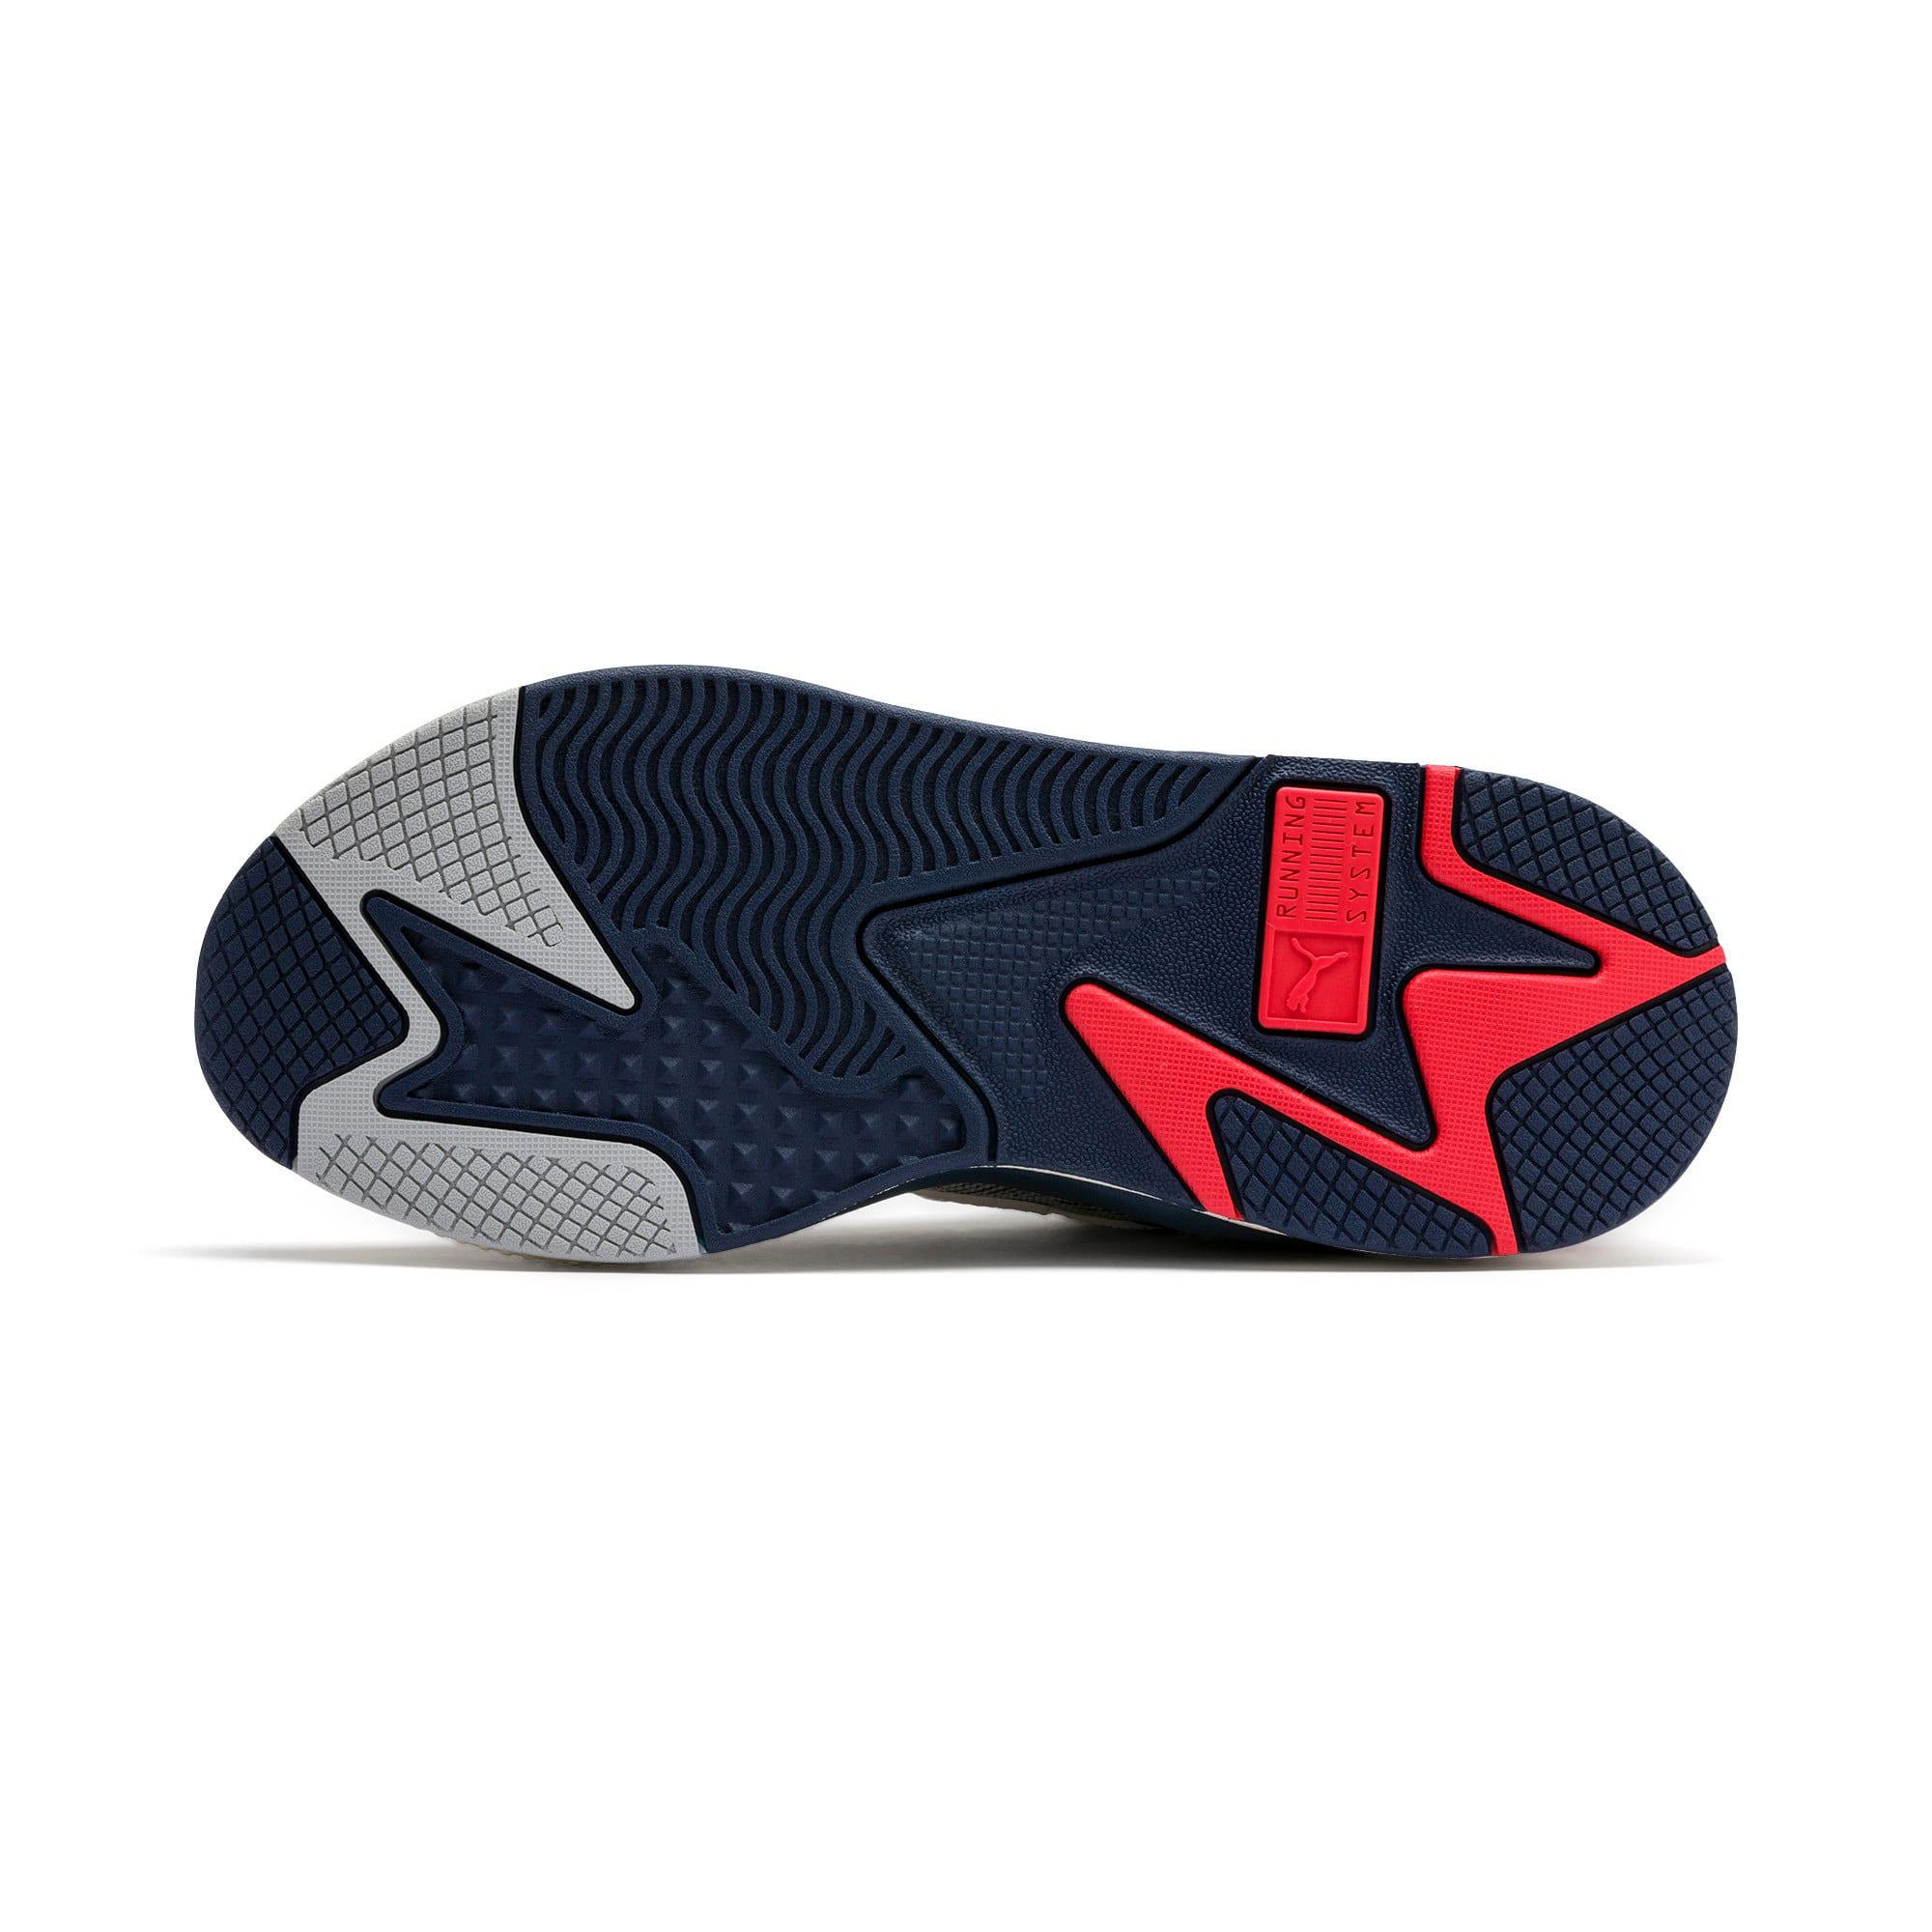 Thumbnail 5 of RS-X Hard Drive Sneakers, Whisper White-Peacoat, medium